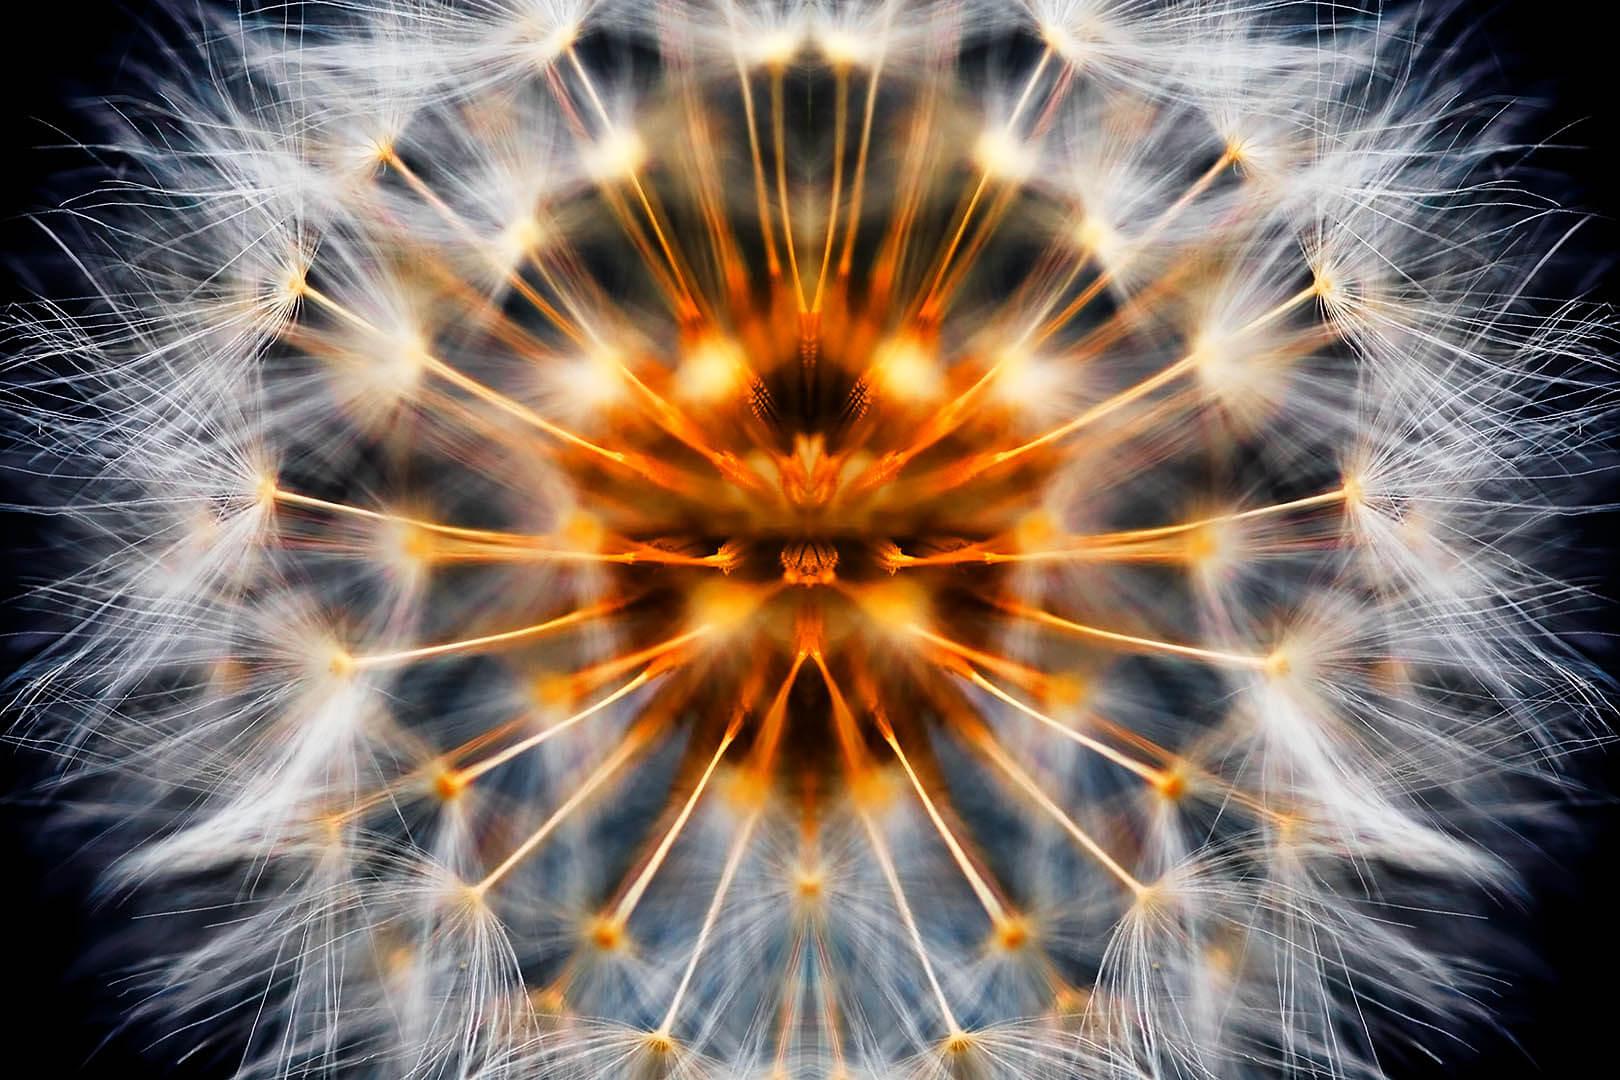 Mirrored Dandelion